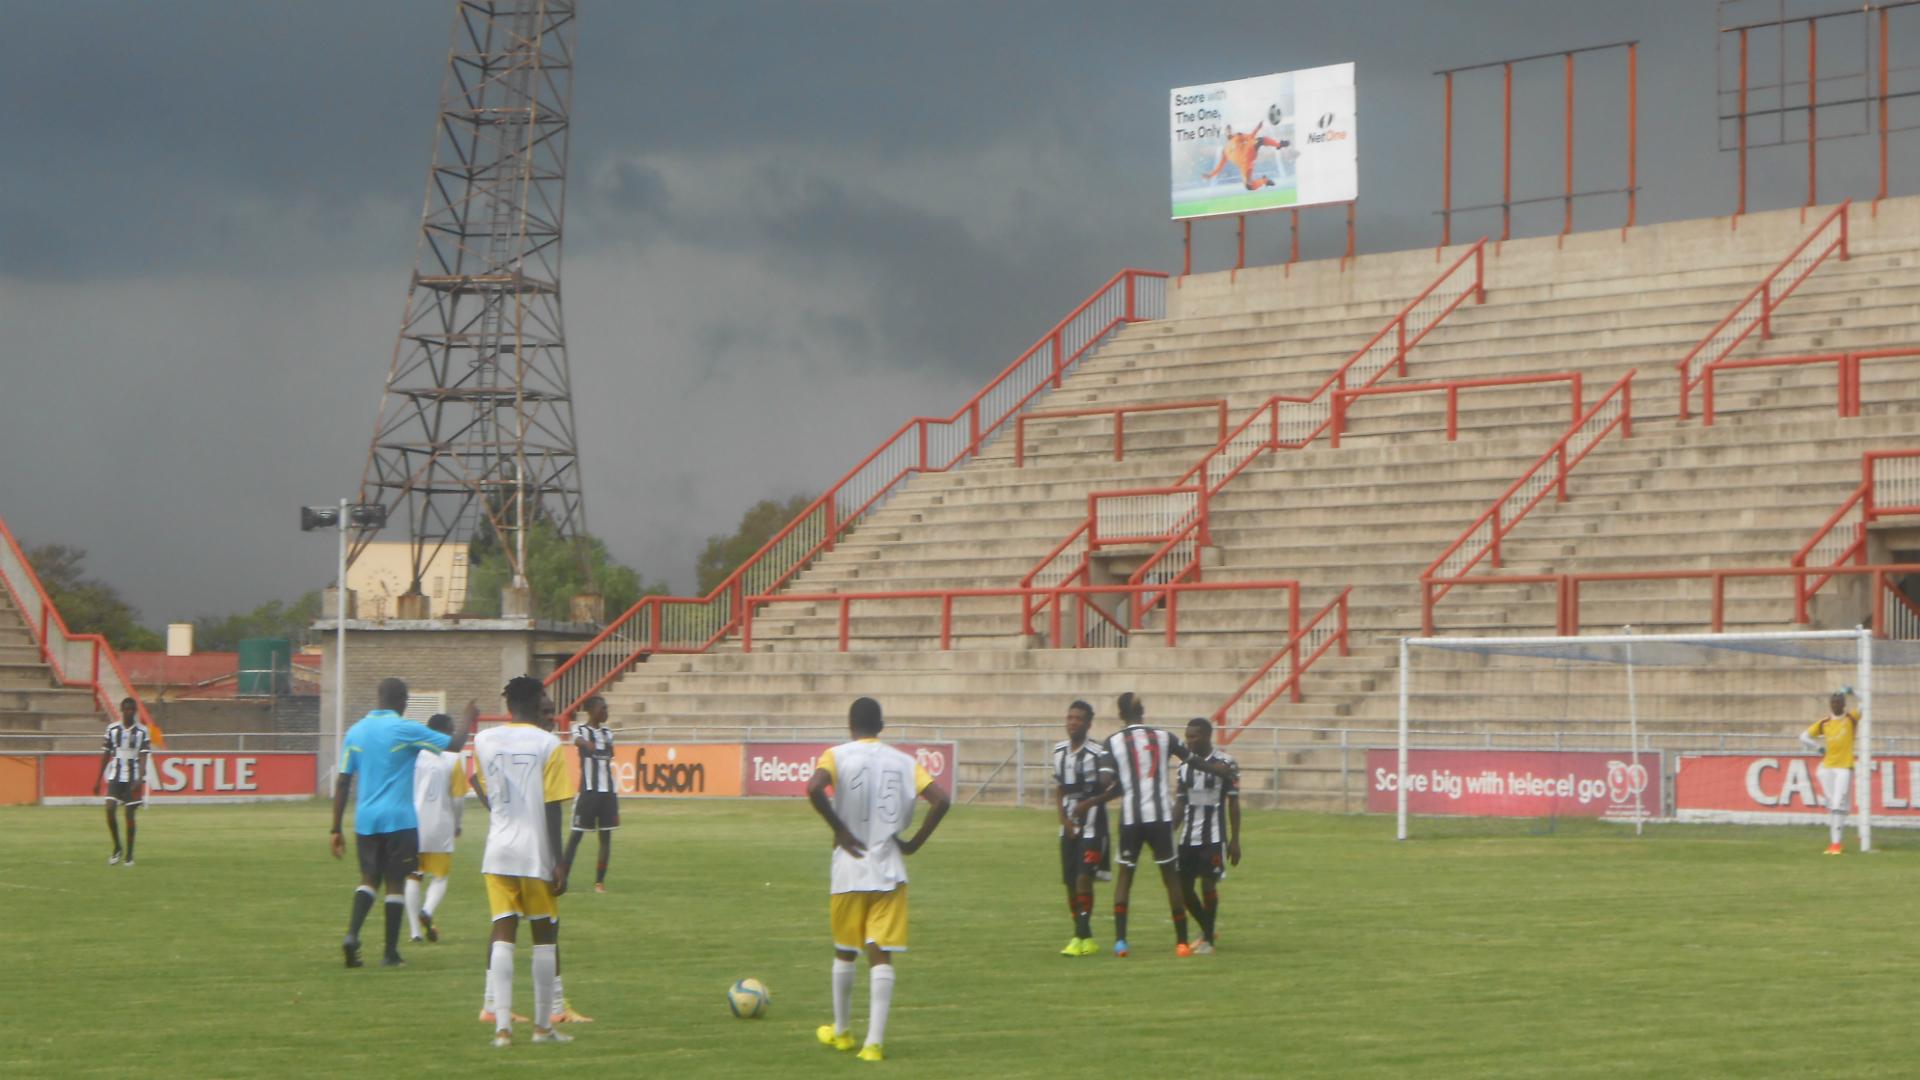 Matabeleland match